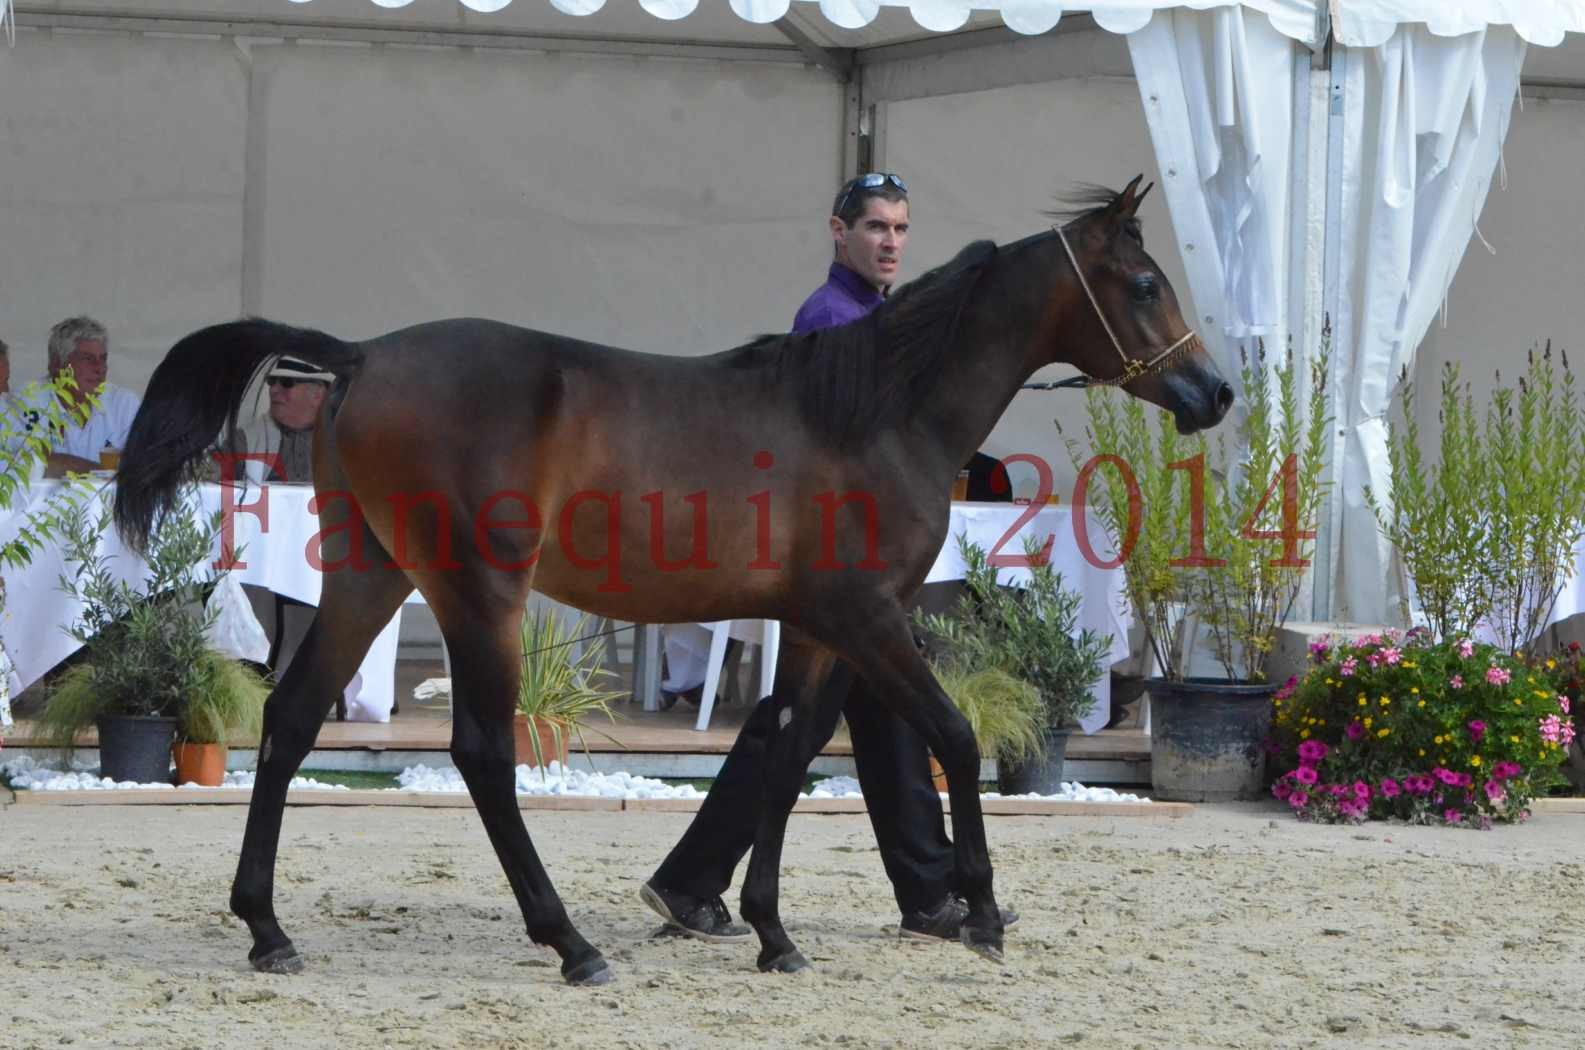 Championnat de FRANCE 2014 - Amateurs - SH FARAJAA - 11